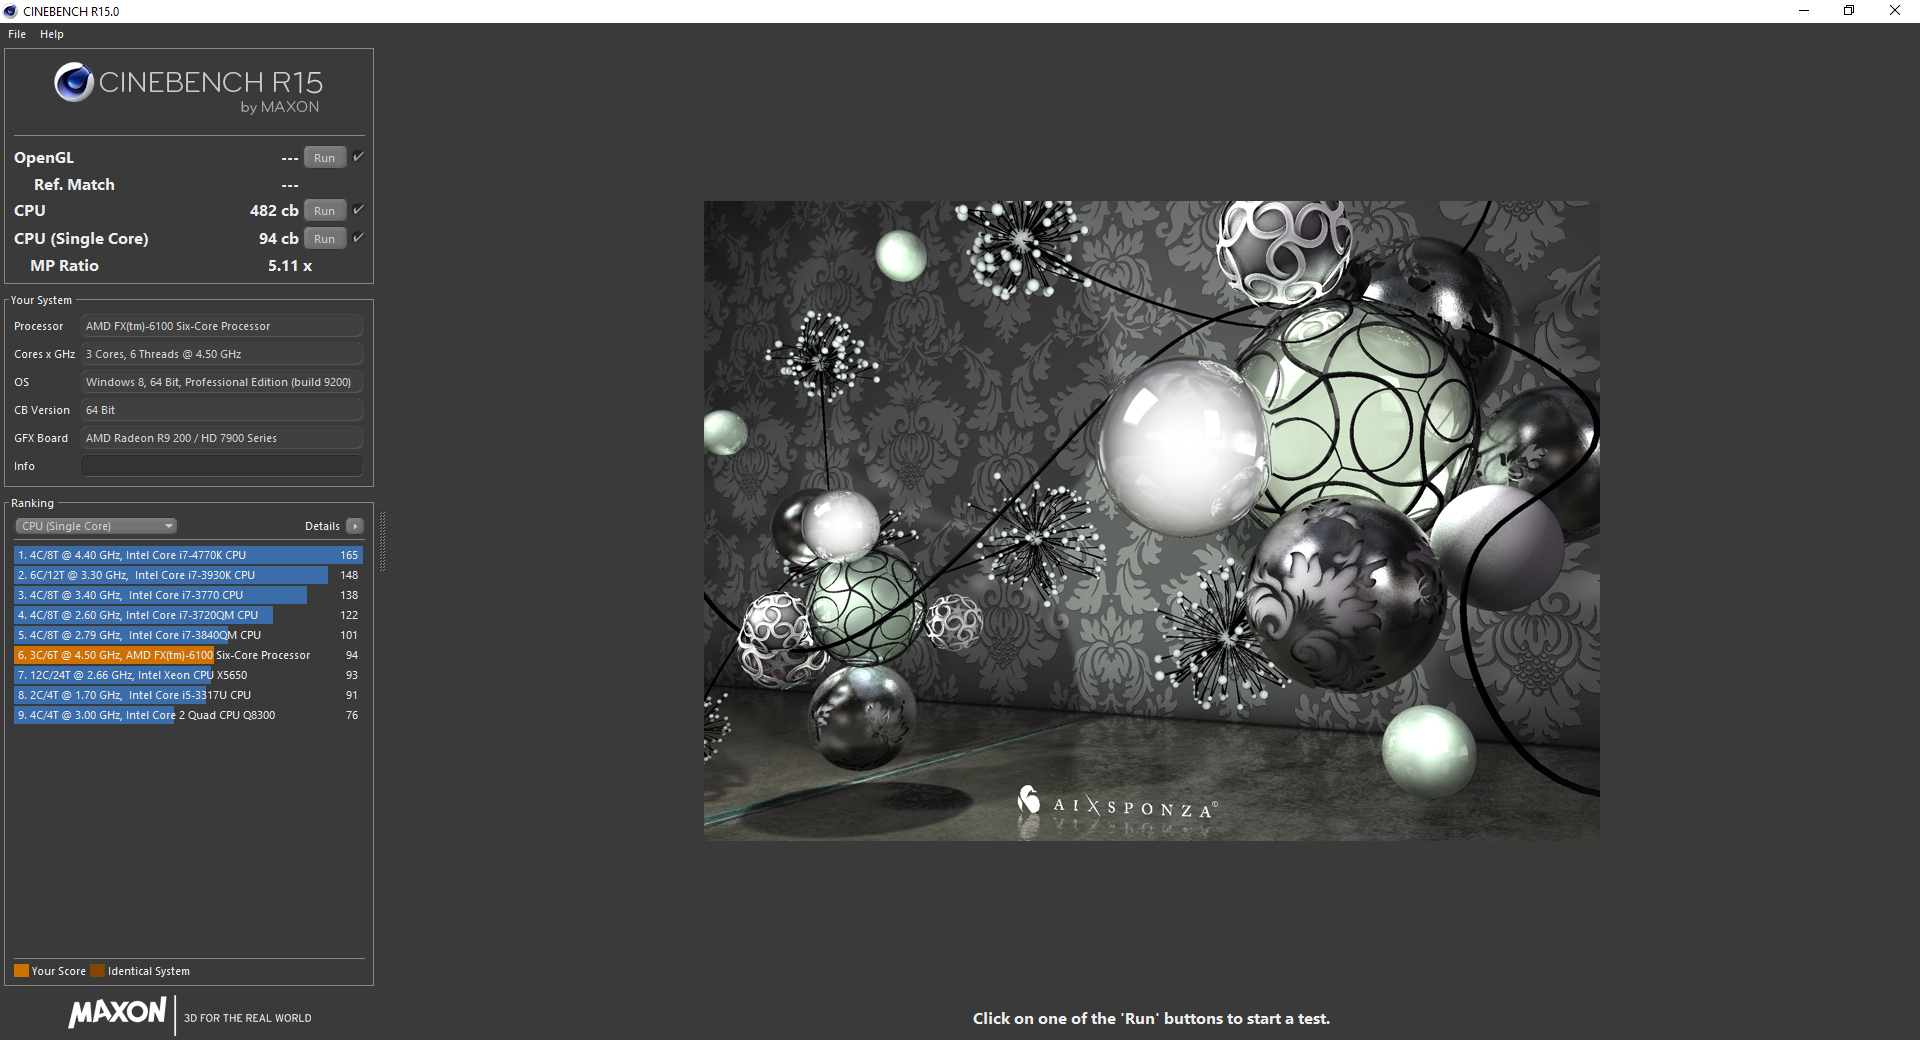 Cinebench R15 AMD FX 6100 4.50GHz